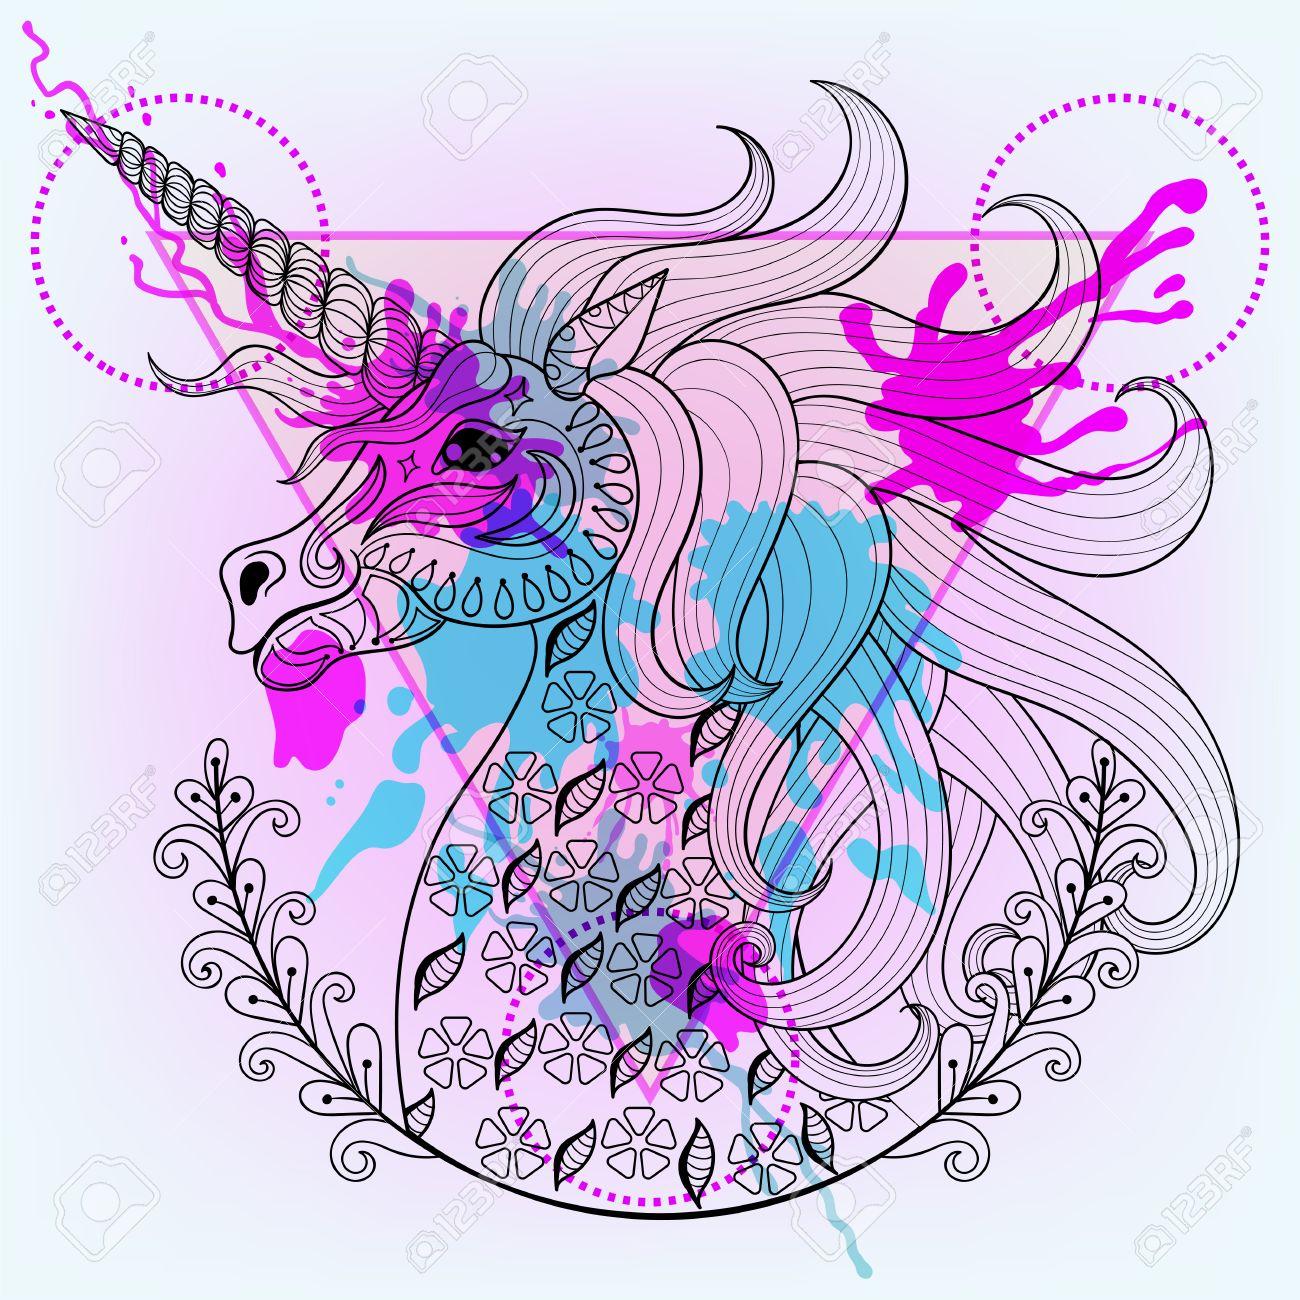 Vector Dibujado A Mano Unicornio Mágico Para Colorear Página Adulta En Estilo Del Tatuaje Del Zentangle Henna Modelado Del Unicornio Con La Gota